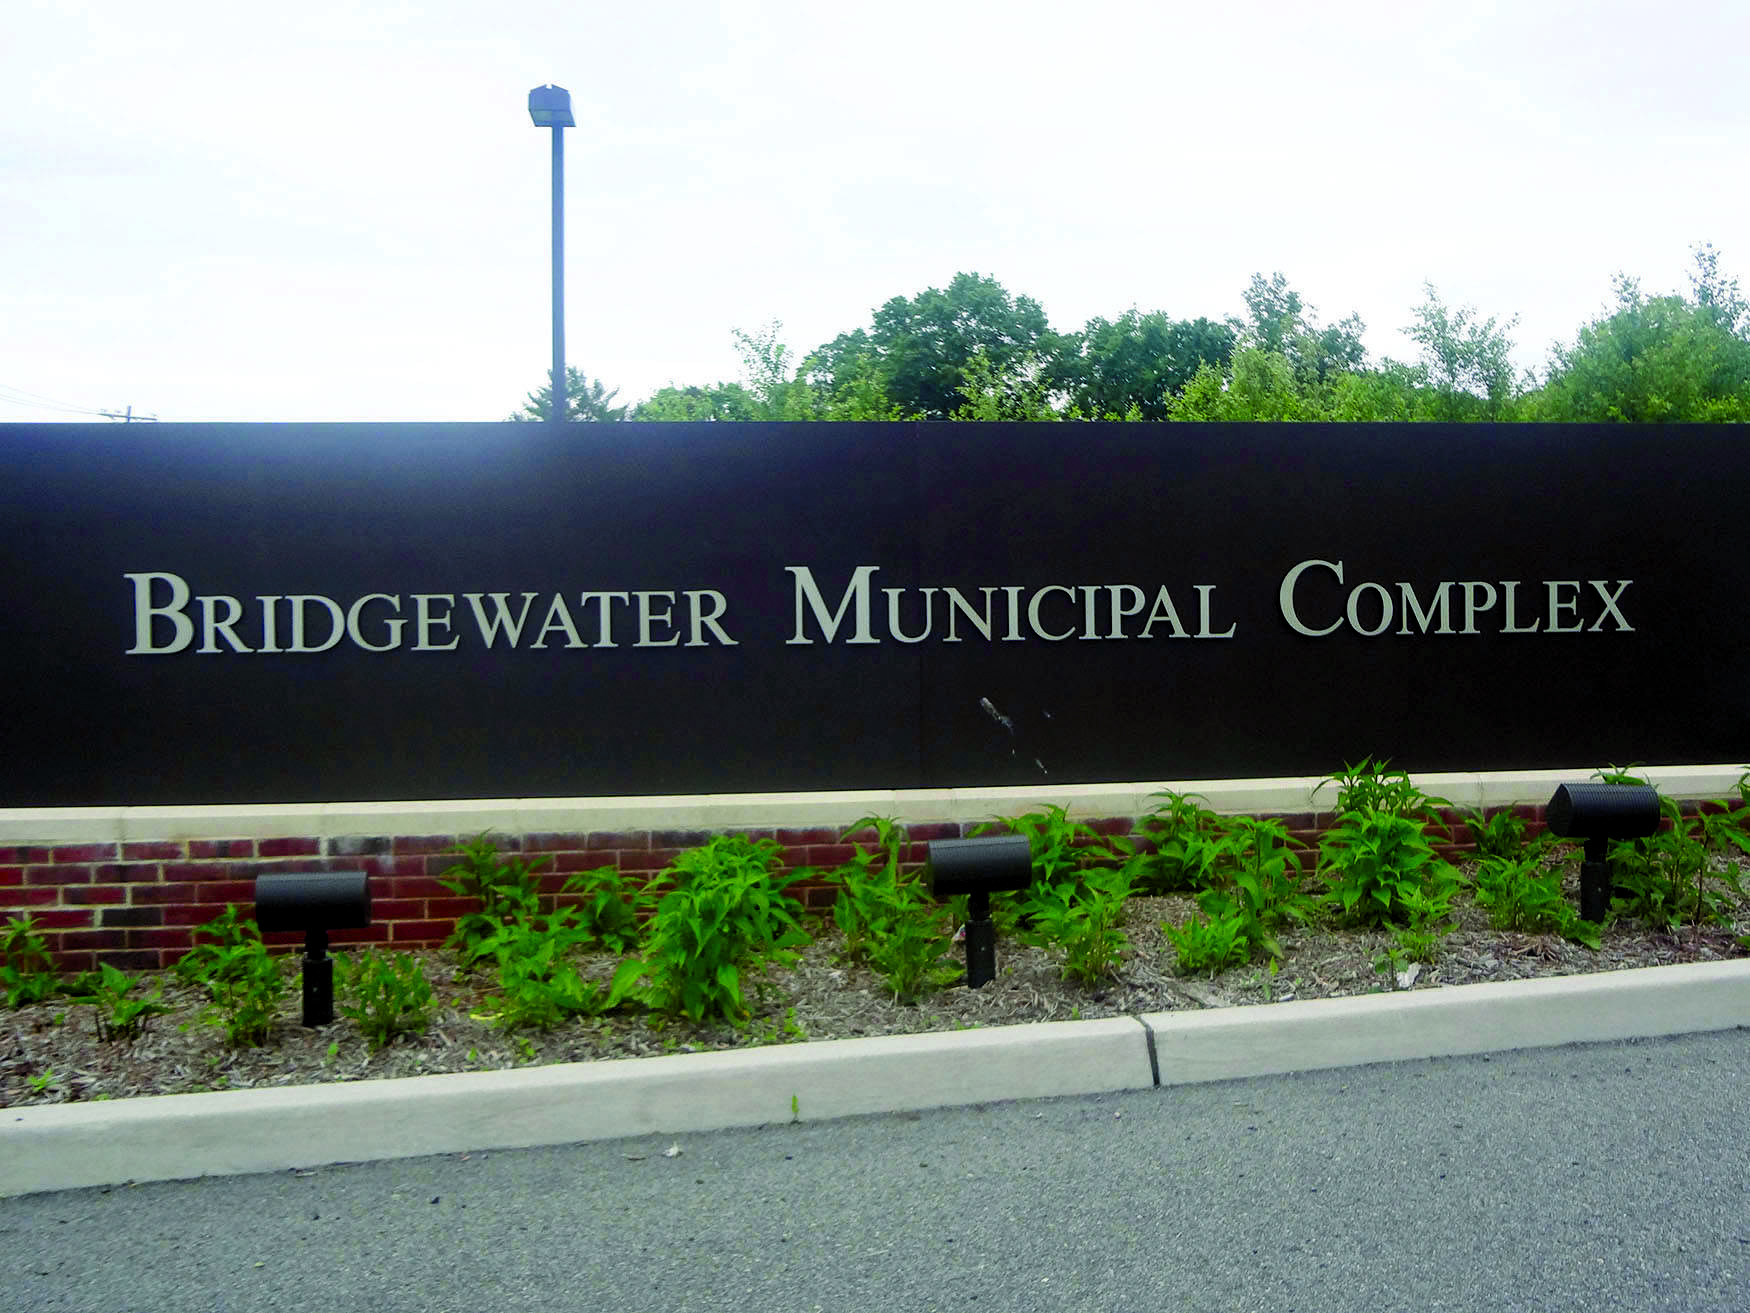 c6eef12452fa3b8d1bdf_Bridgewater_municipal.jpg